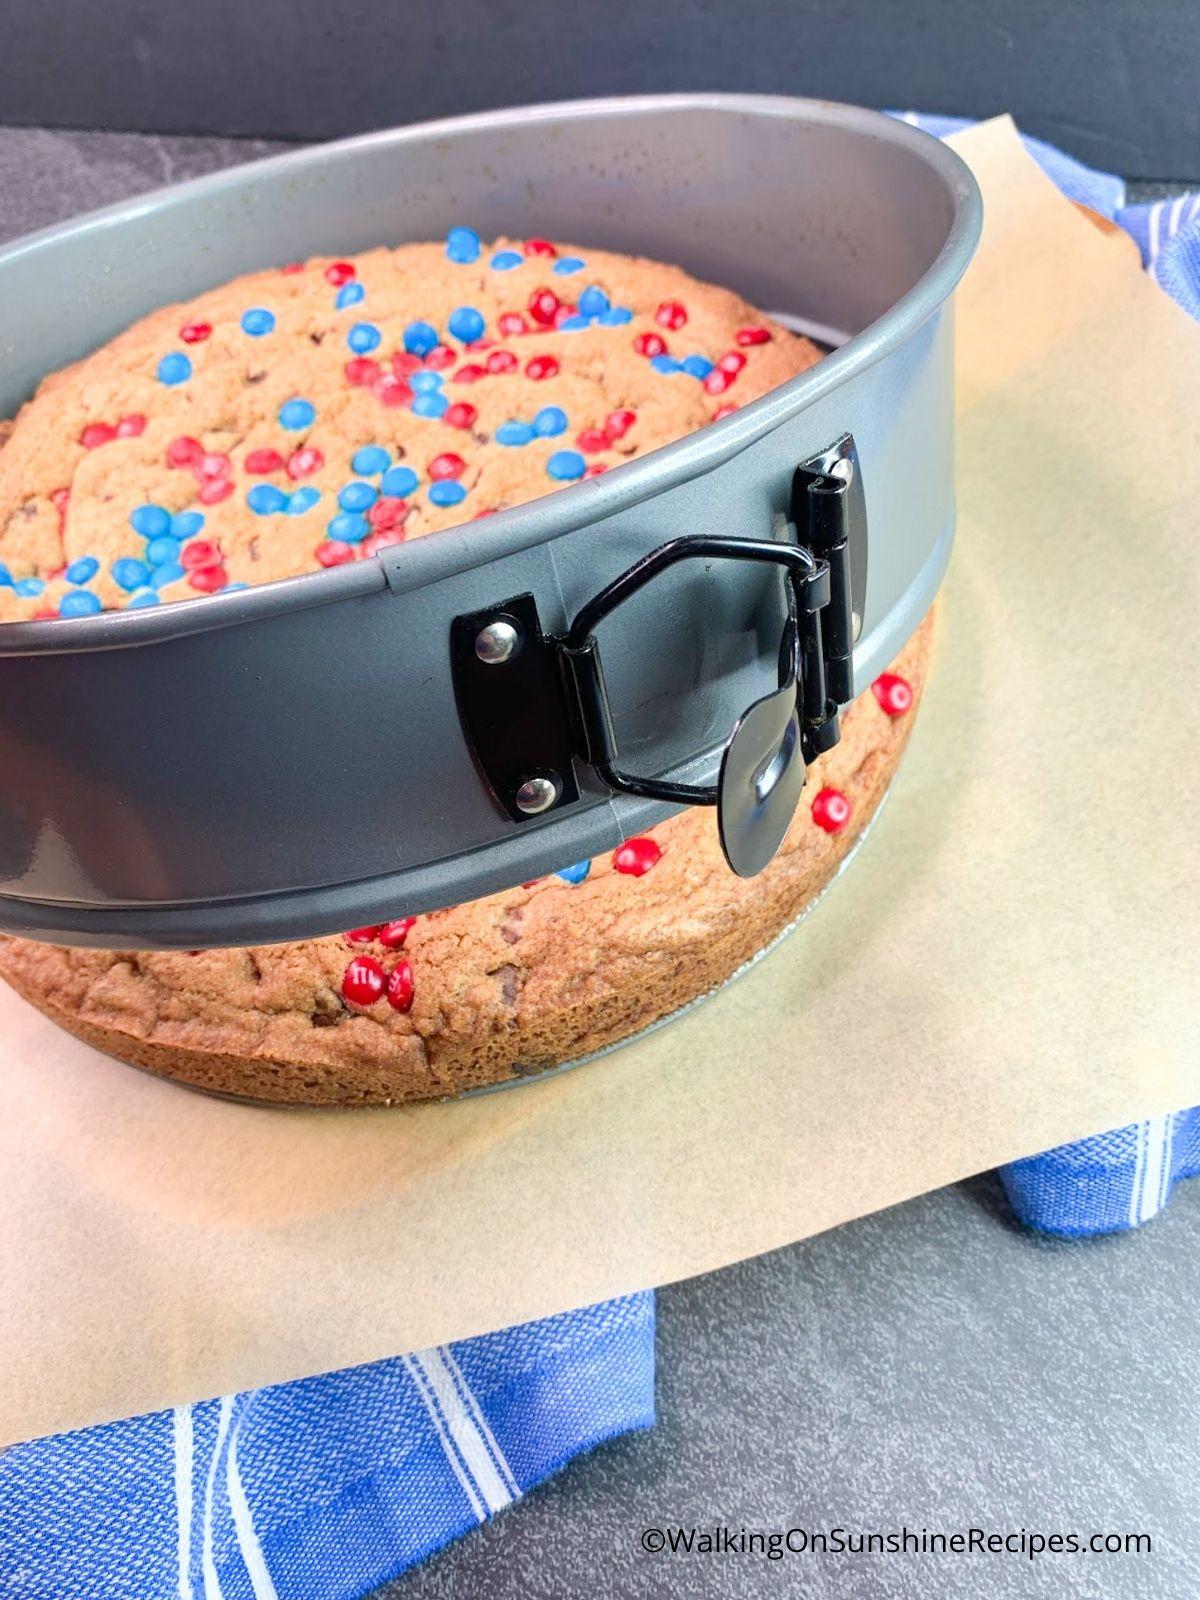 Giant Cookie Cake in Springform Pan.